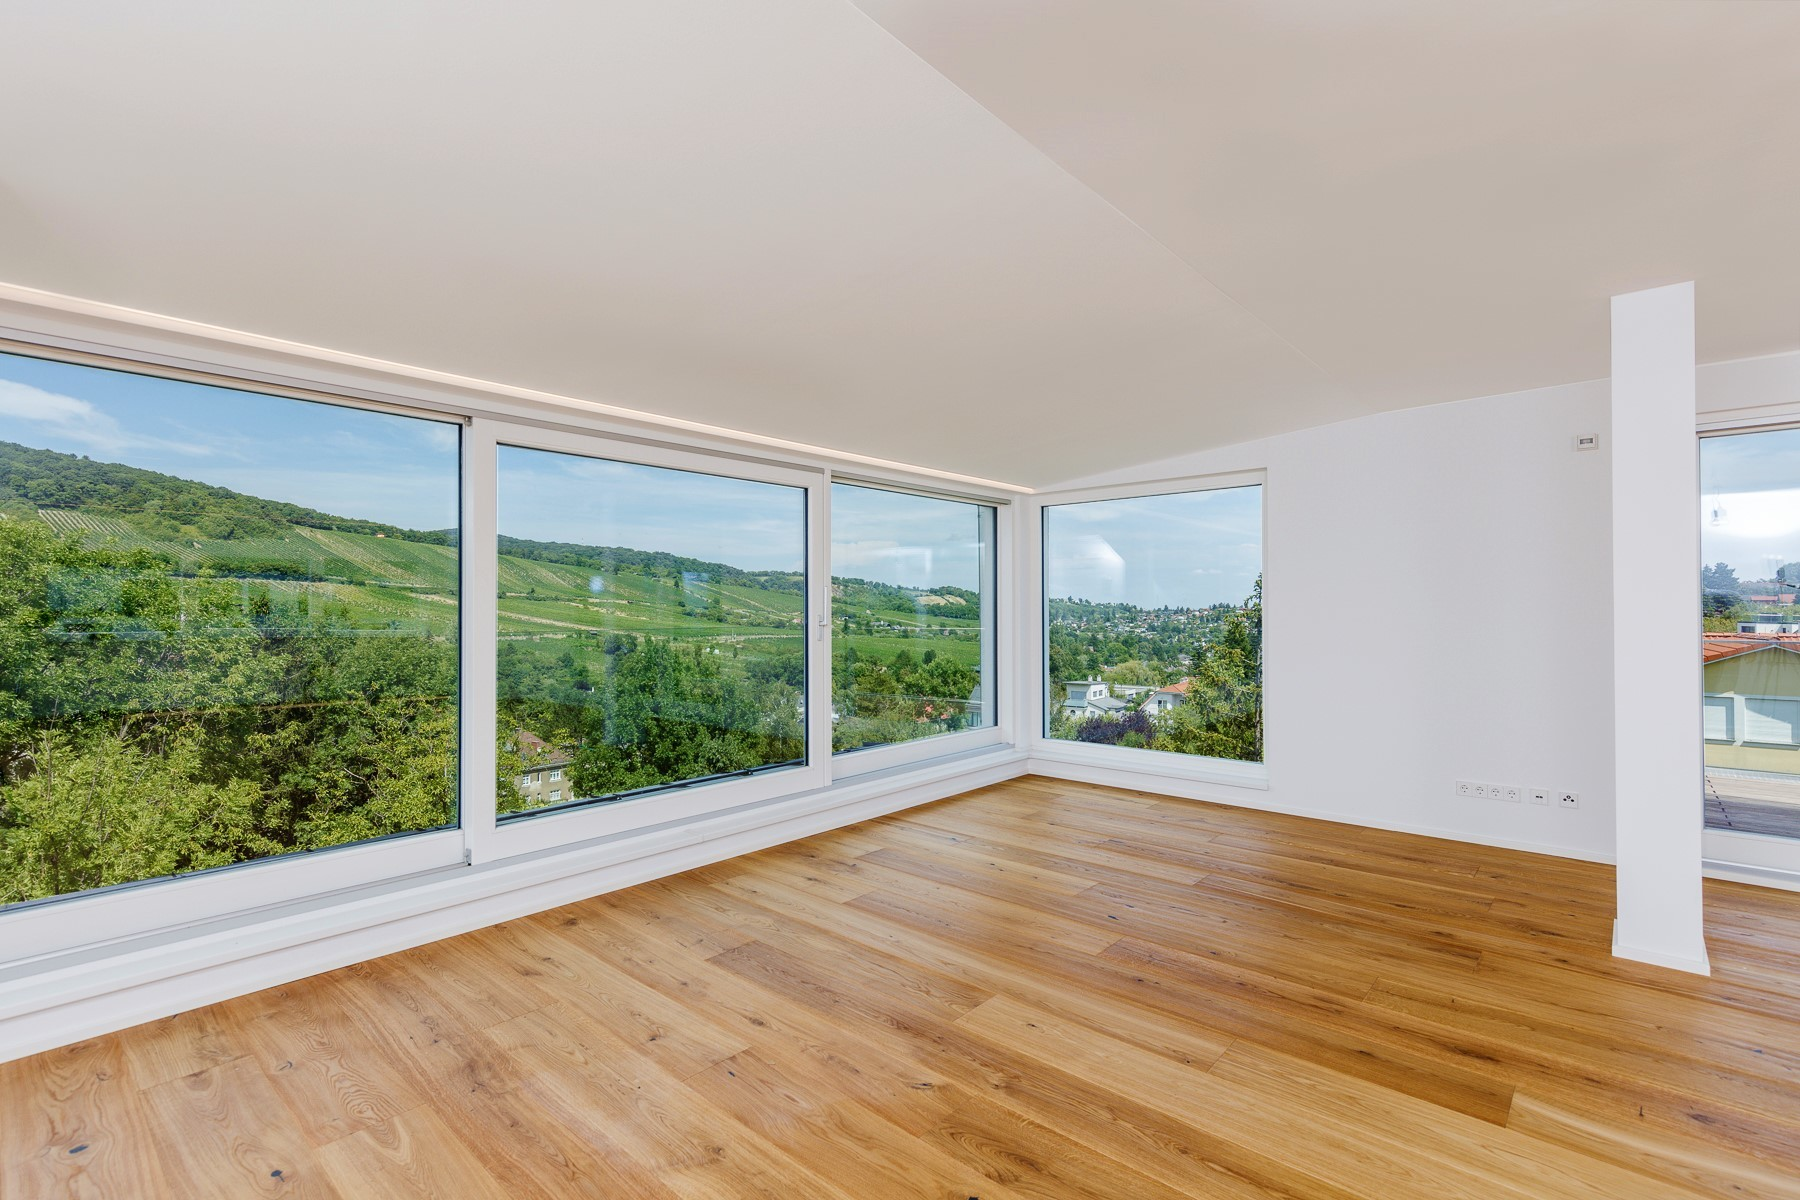 Penthouse der Extraklasse mit 4 Terrassen - spektakulärer Ausblick Objekt_31568